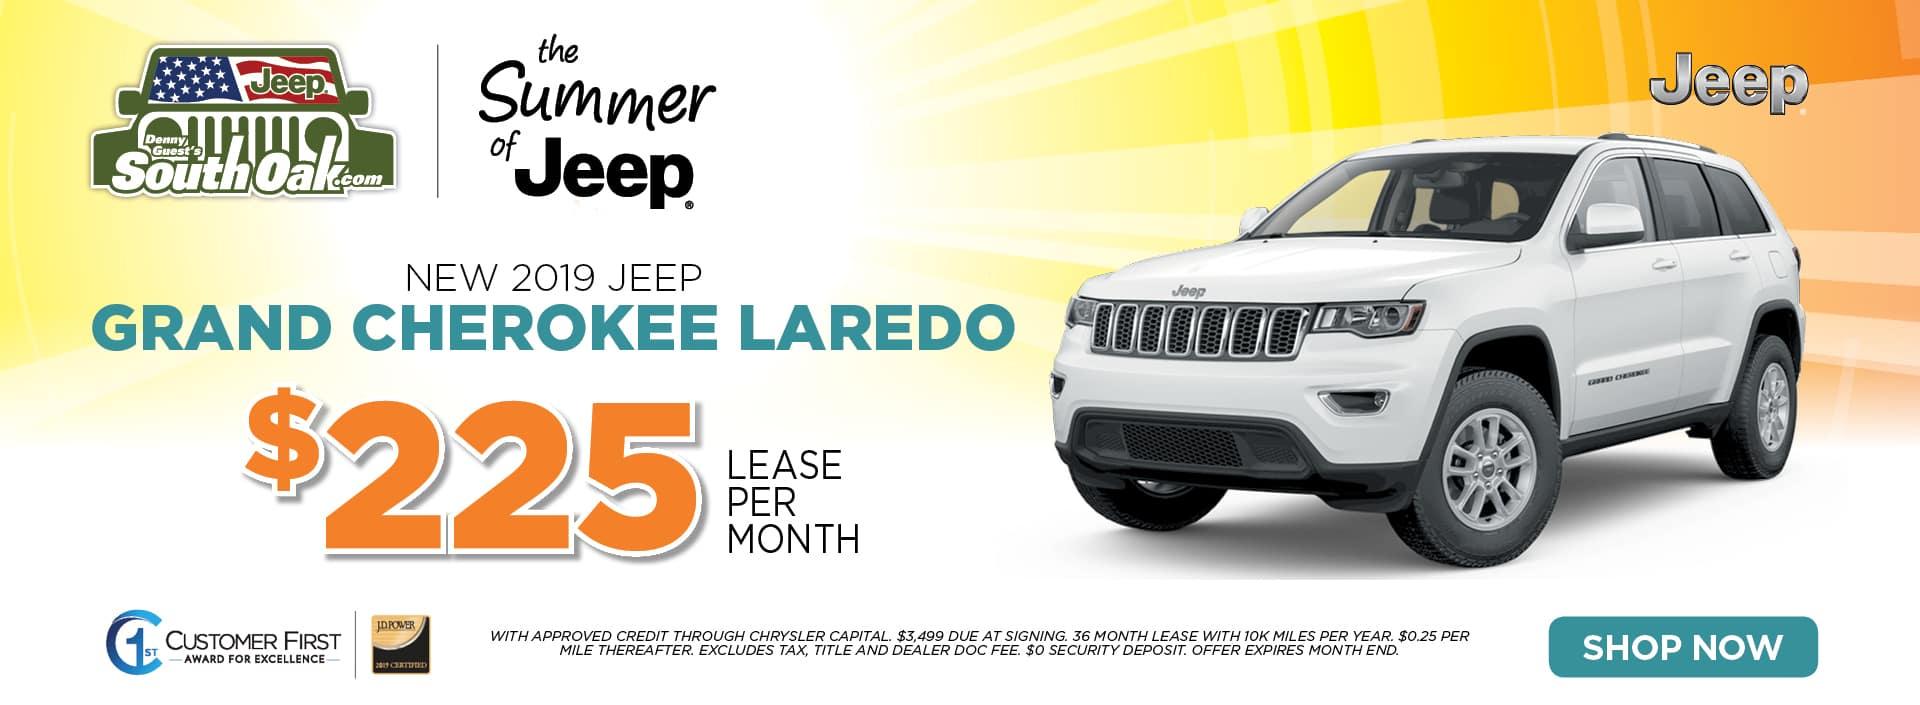 South Oak Jeep Dodge Chrysler Ram | CDJR Dealer in Matteson, IL